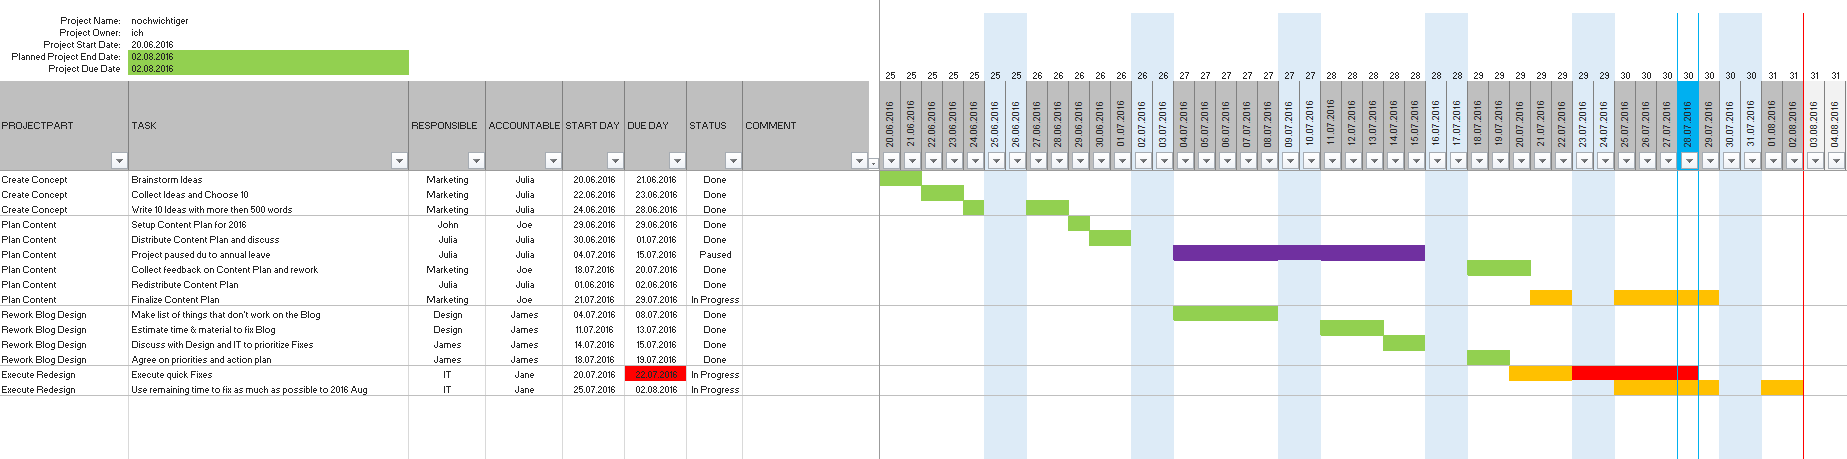 Einfacher Projektplan als Excel Template – Update 2 – fischerberger ...